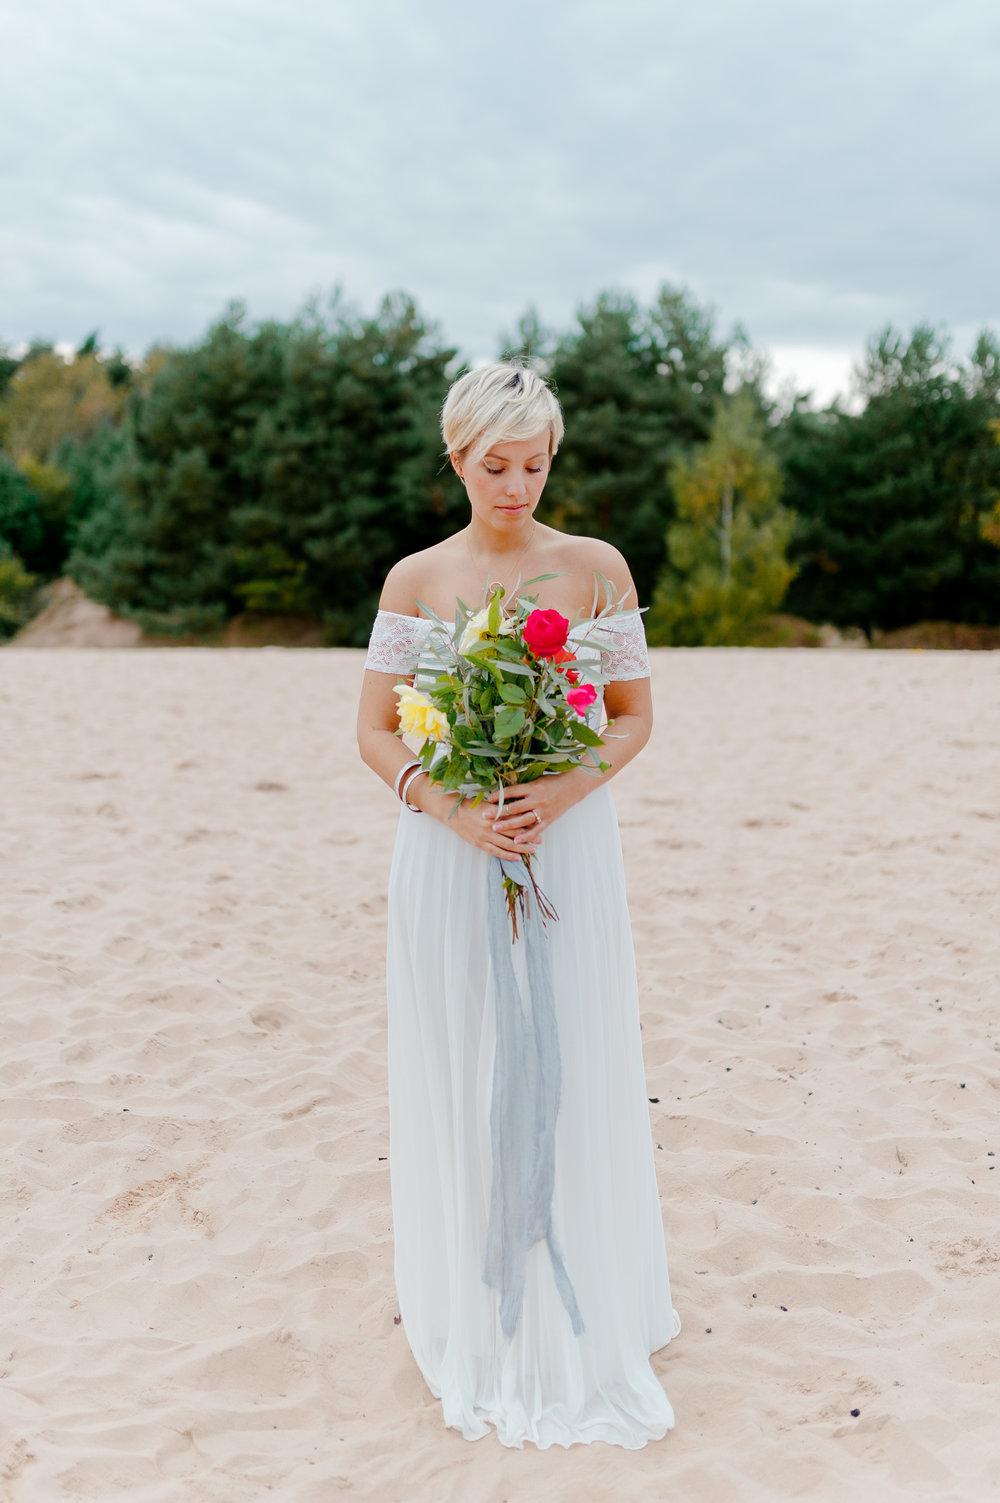 Anna-Hari-Photography-Hochzeitsfotograf-Bielefeld-8.jpg